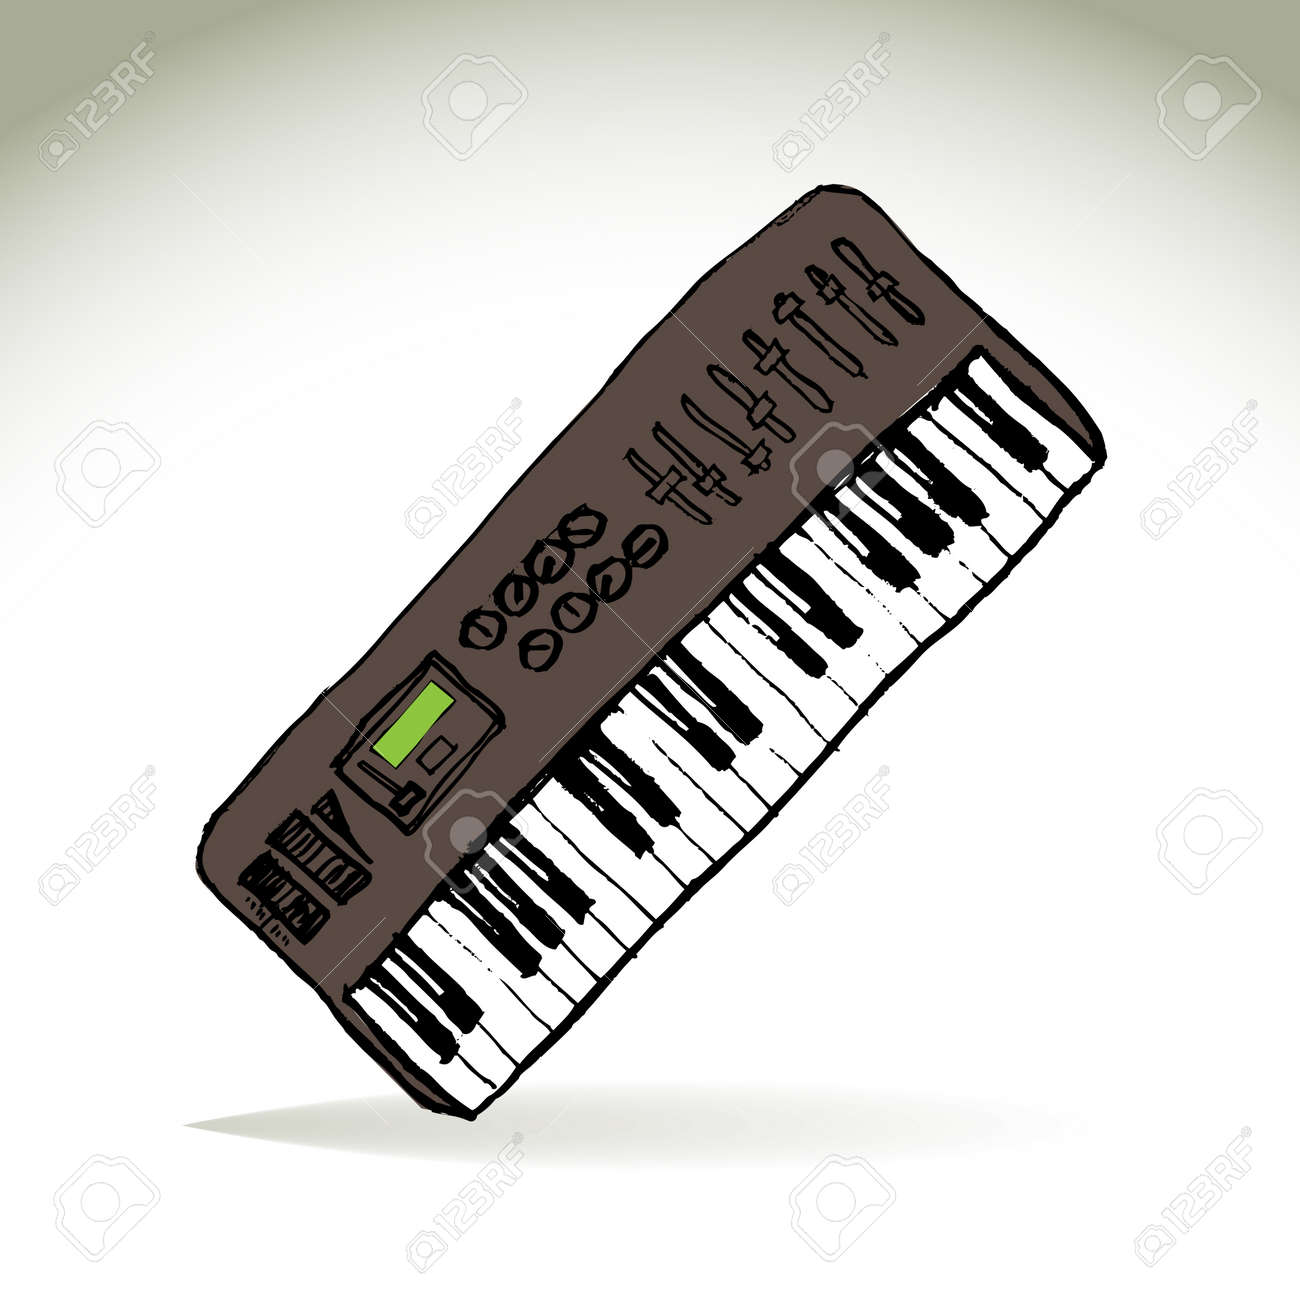 Music midi master keyboard - illustration Stock Vector - 21904814